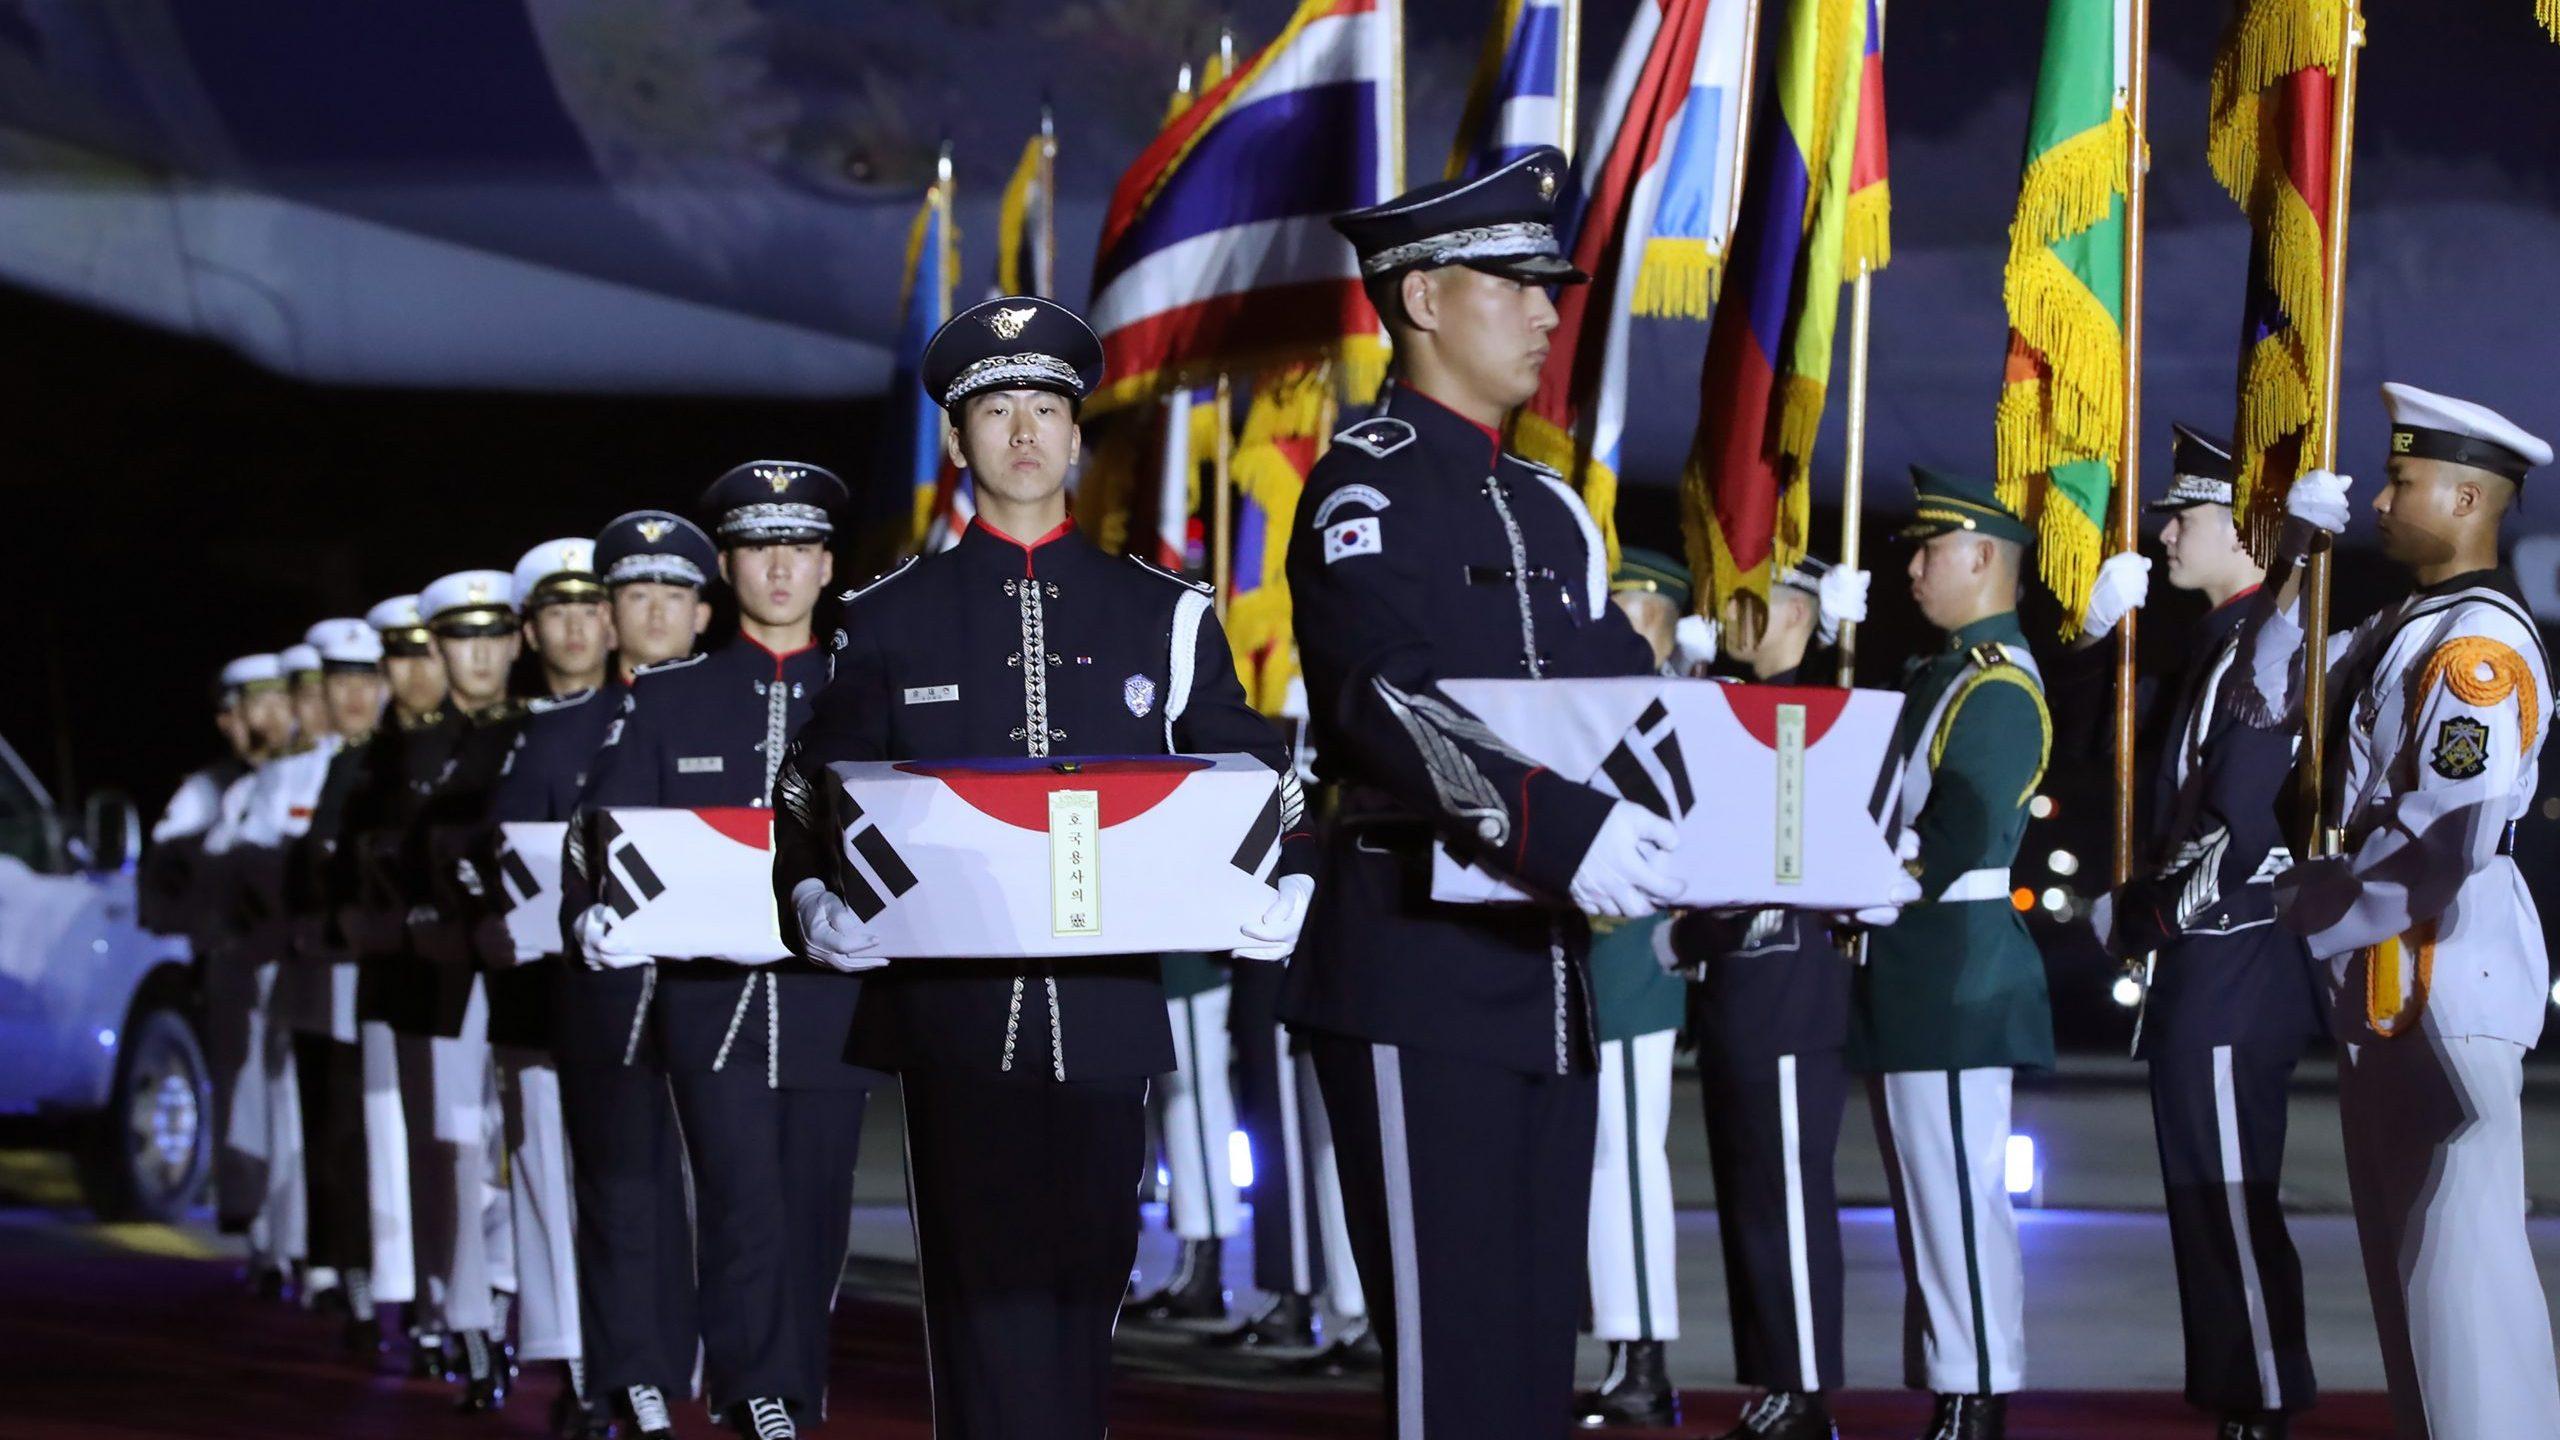 Dve Koreje obeležile 70. godišnjicu početka Korejskog rata (FOTO) 2